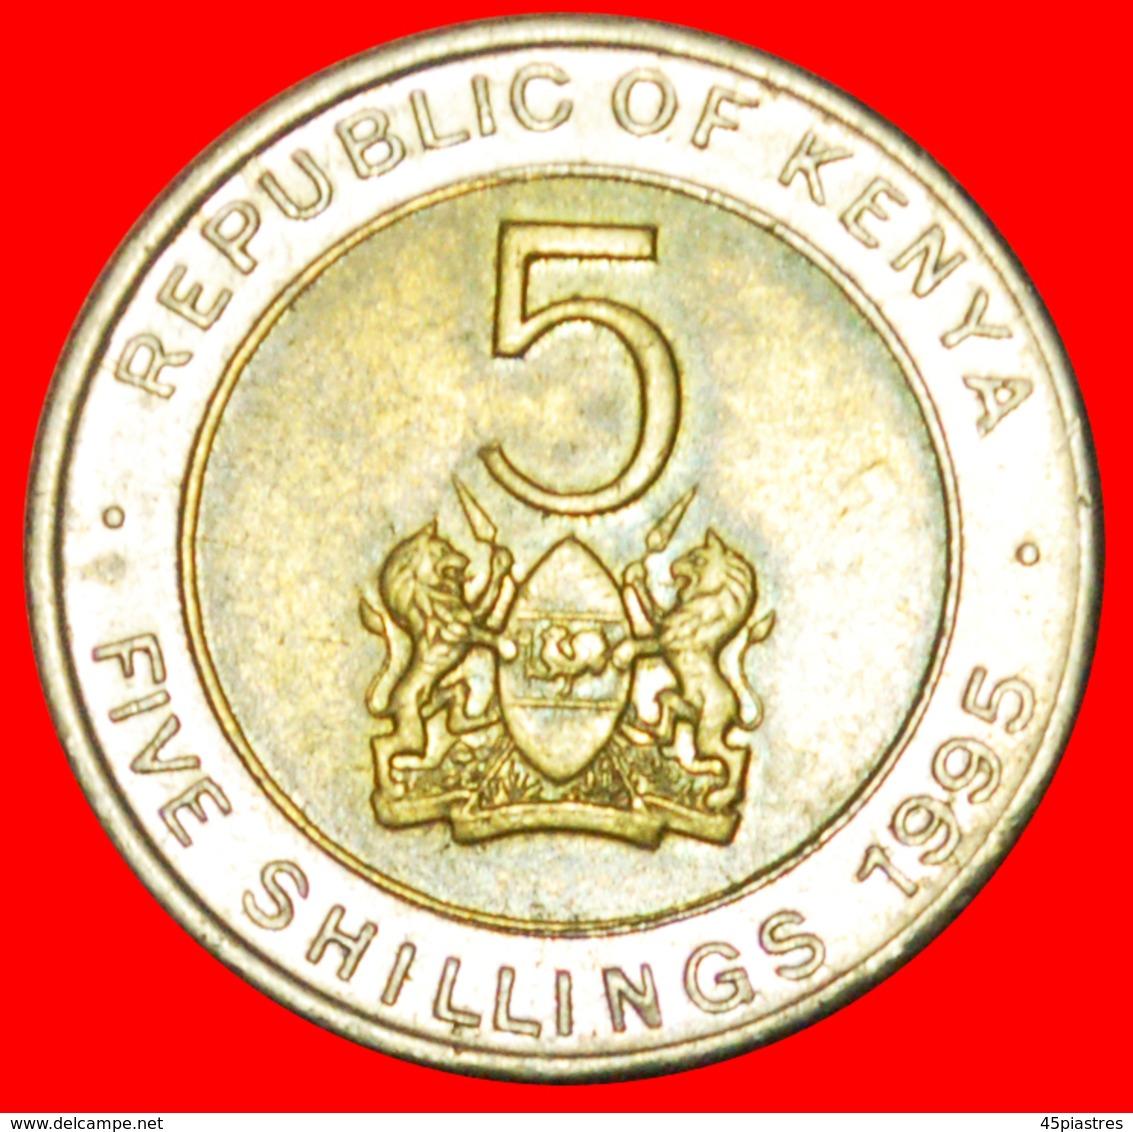 # COCK AND LIONS (1995-1997): KENYA ★ 5 SHILLINGS 1995! LOW START ★ NO RESERVE! Daniel Toroitich Arap Moi (1978-2002) - Kenya